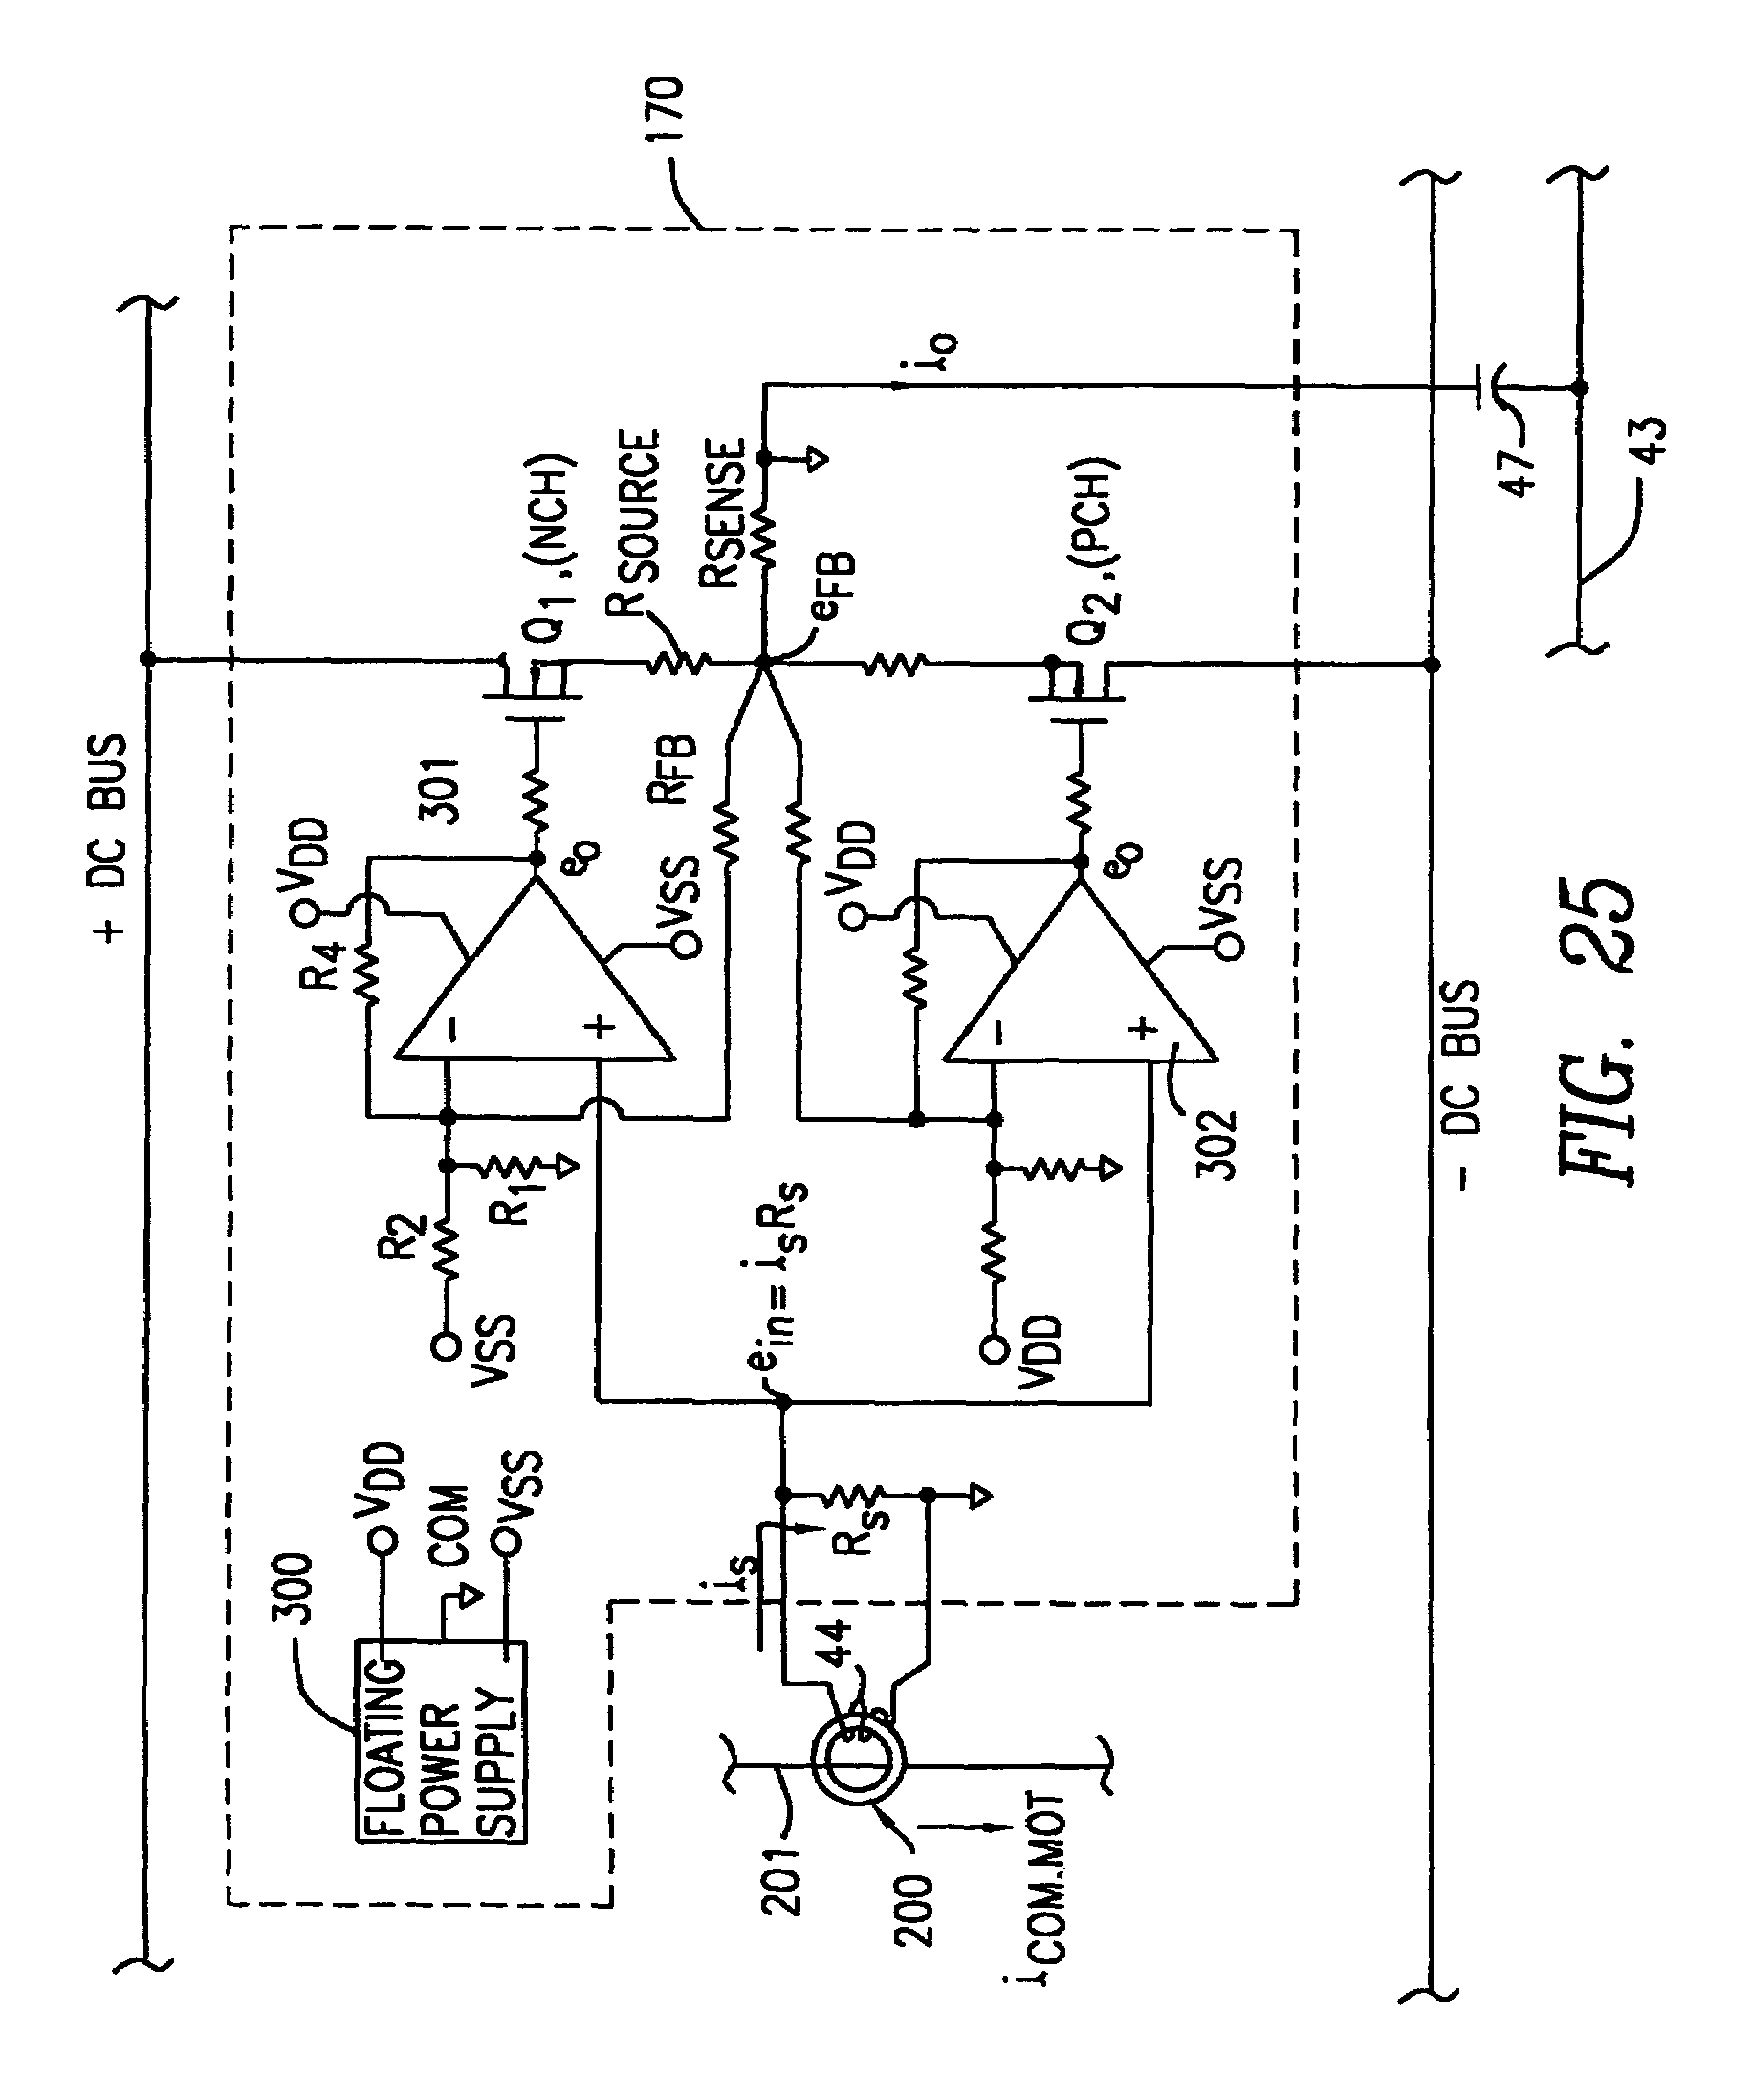 wiring diagrams free download car alarm wiring diagrams free download  automotive wiring diagrams free download jeep